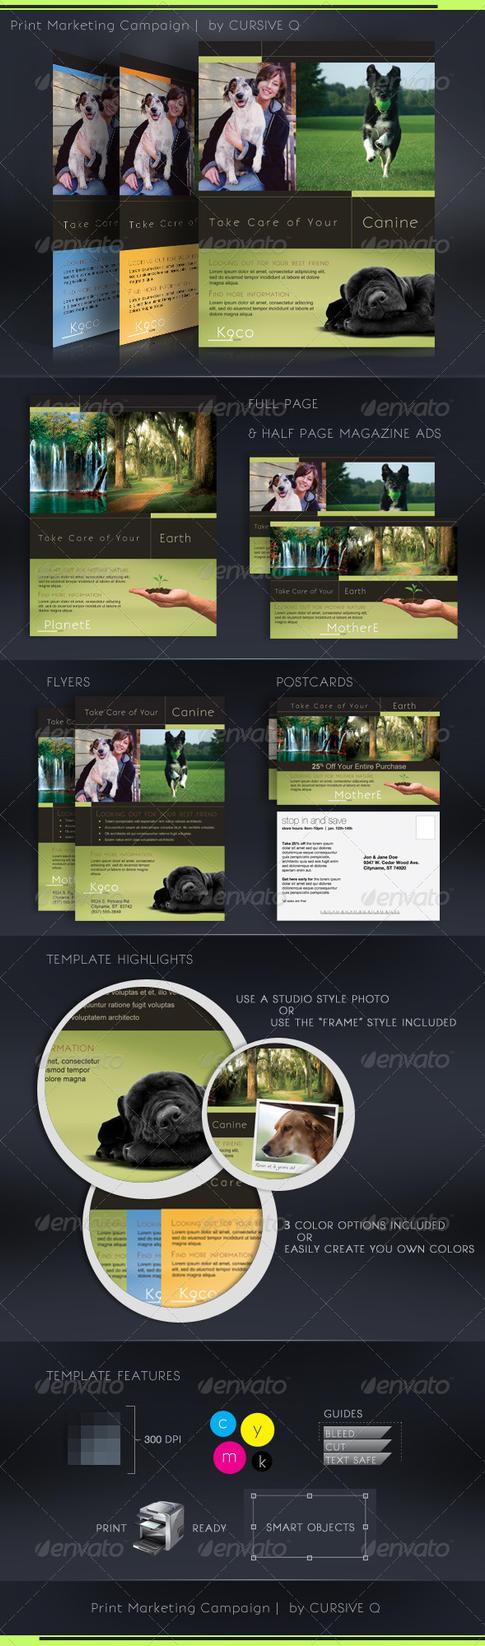 Print Marketing Templates PSD by CursiveQ-Designs